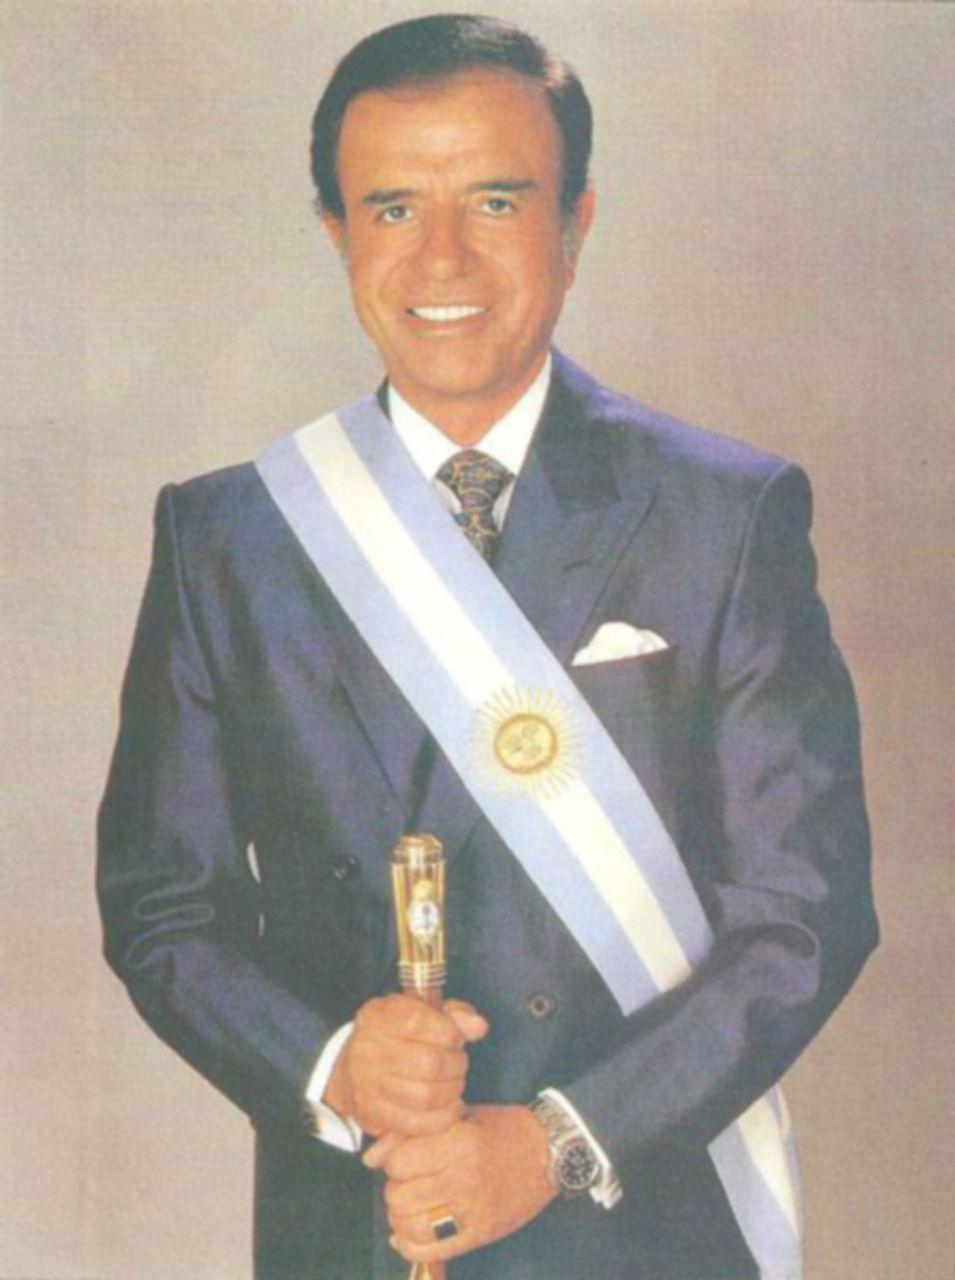 Argentine president Carlos Menem (1989-99)